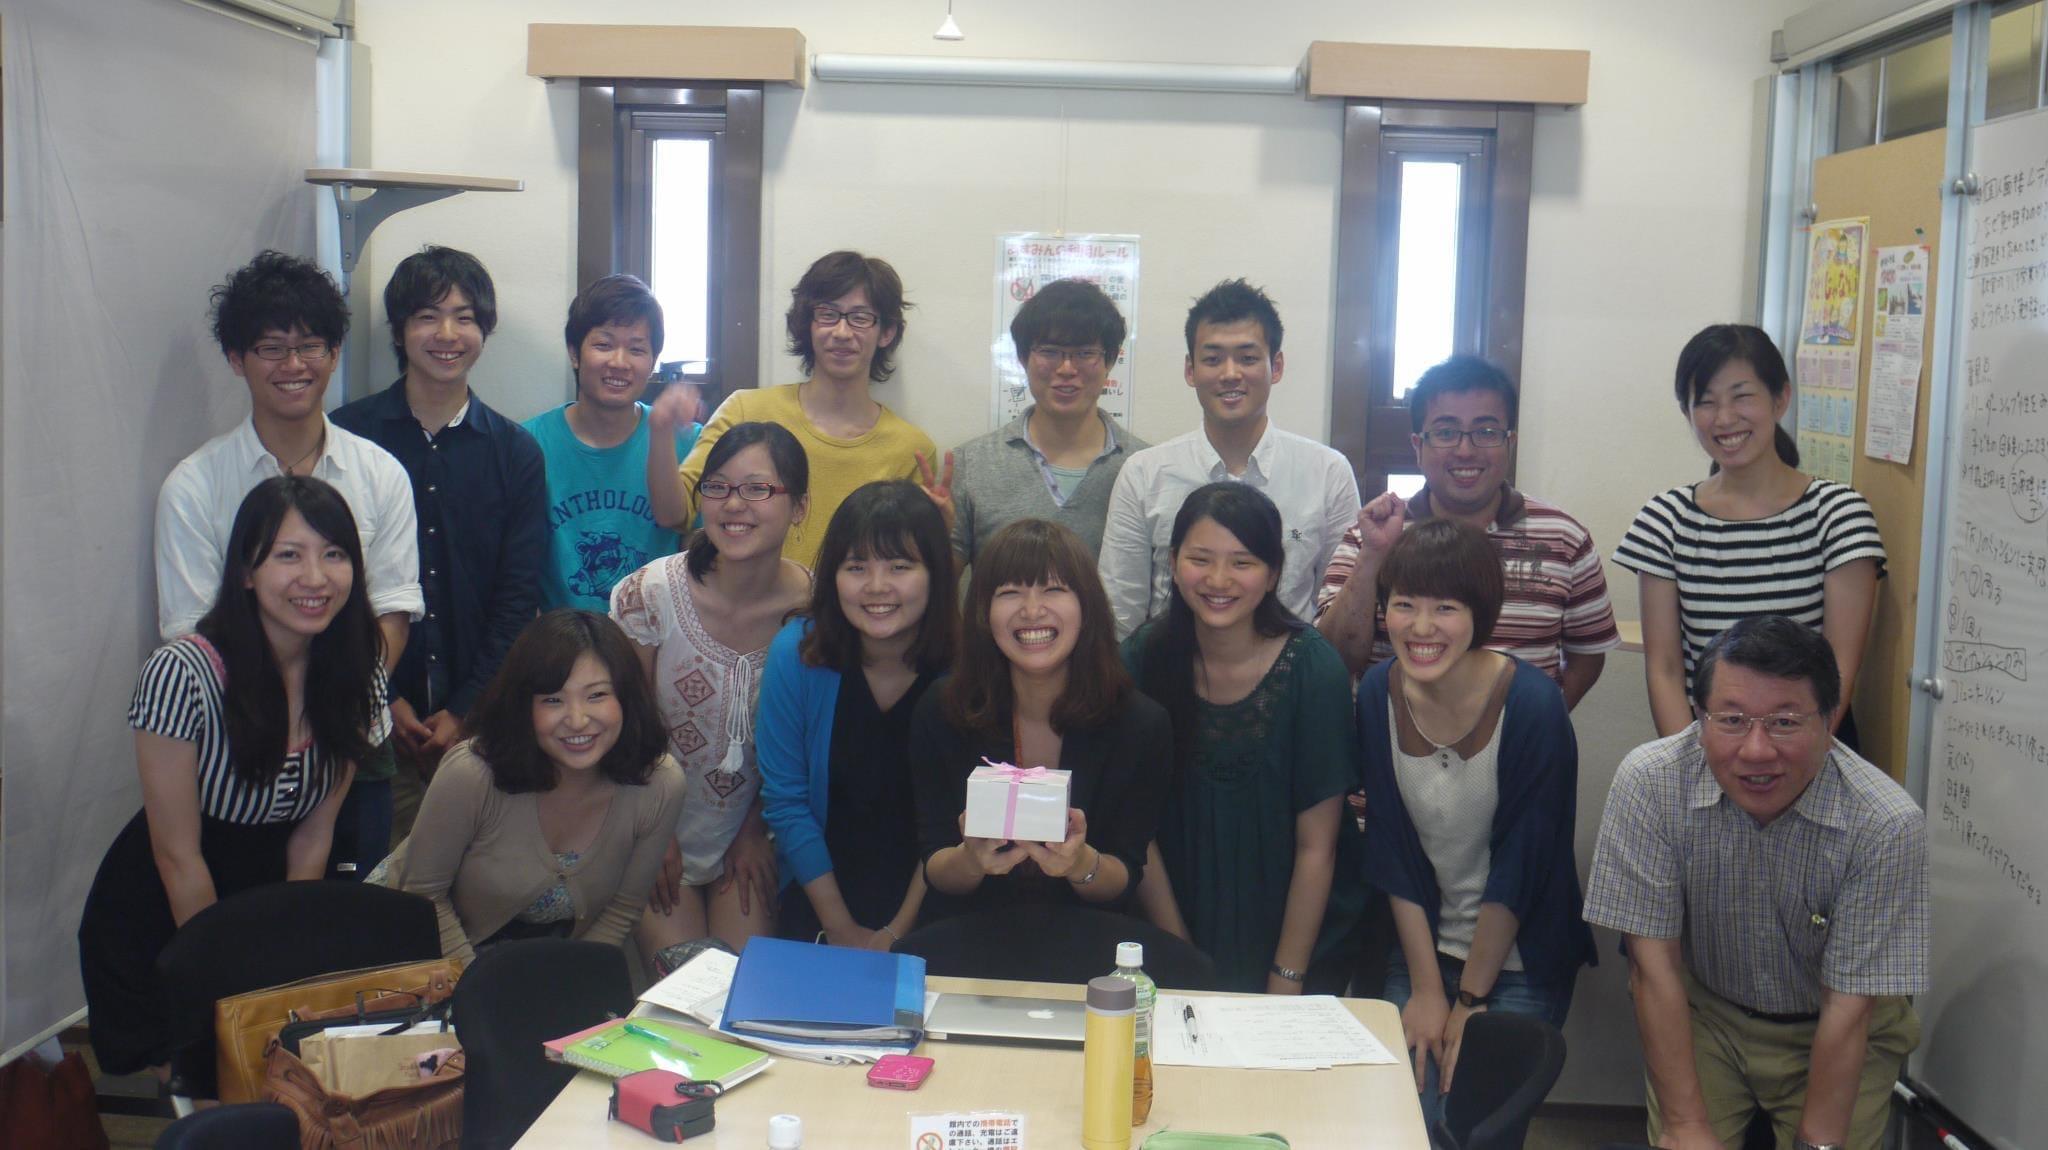 TFJ九州事業部1周年の集合写真。森山さん(中央)の笑顔がはじけています。